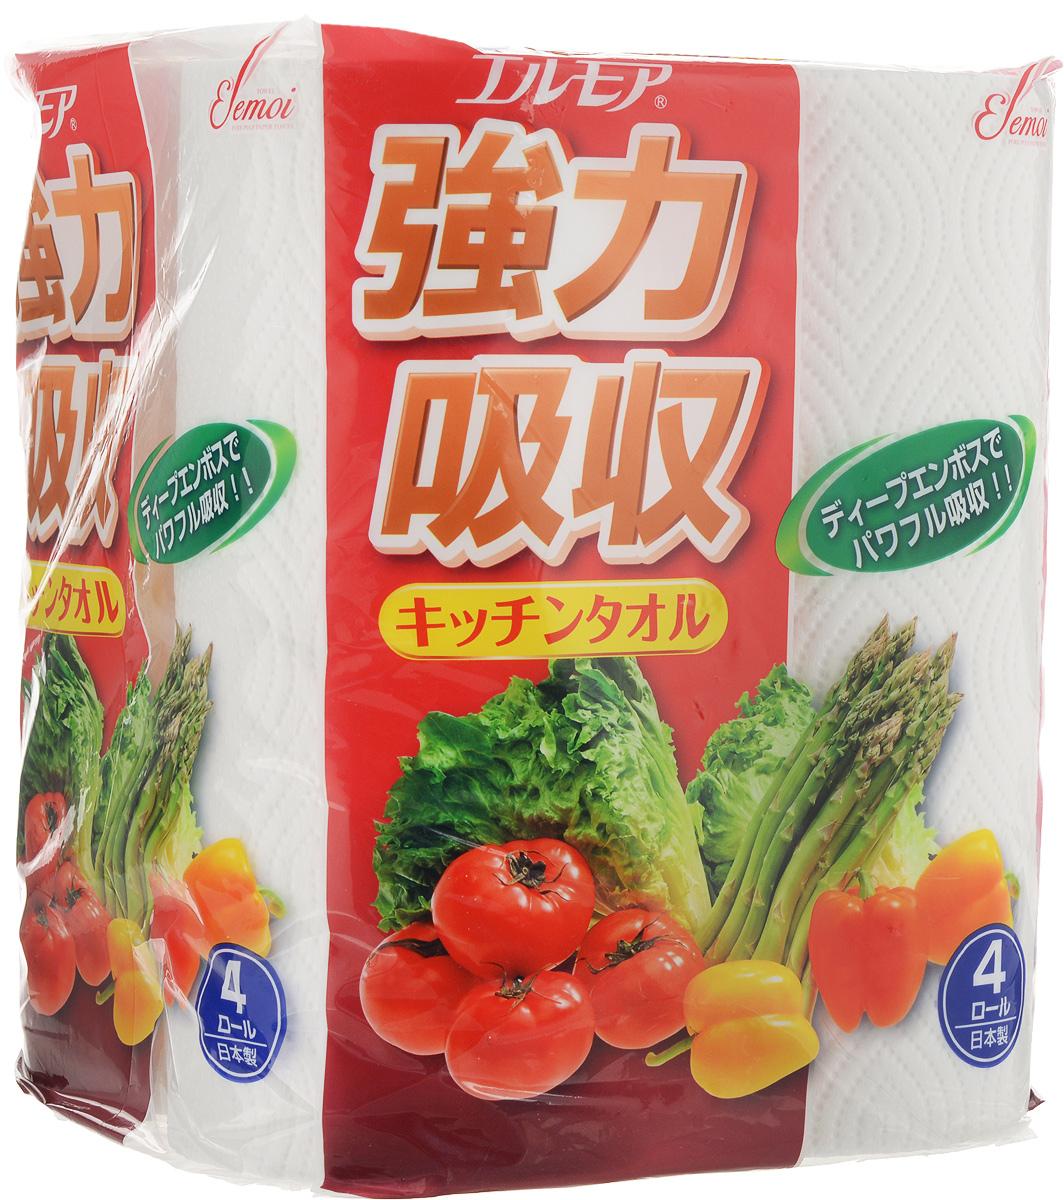 Фото - Полотенца бумажные Ellemoi, 4 рулона салфетки и полотенца для дома jie yun hygienix 250 3